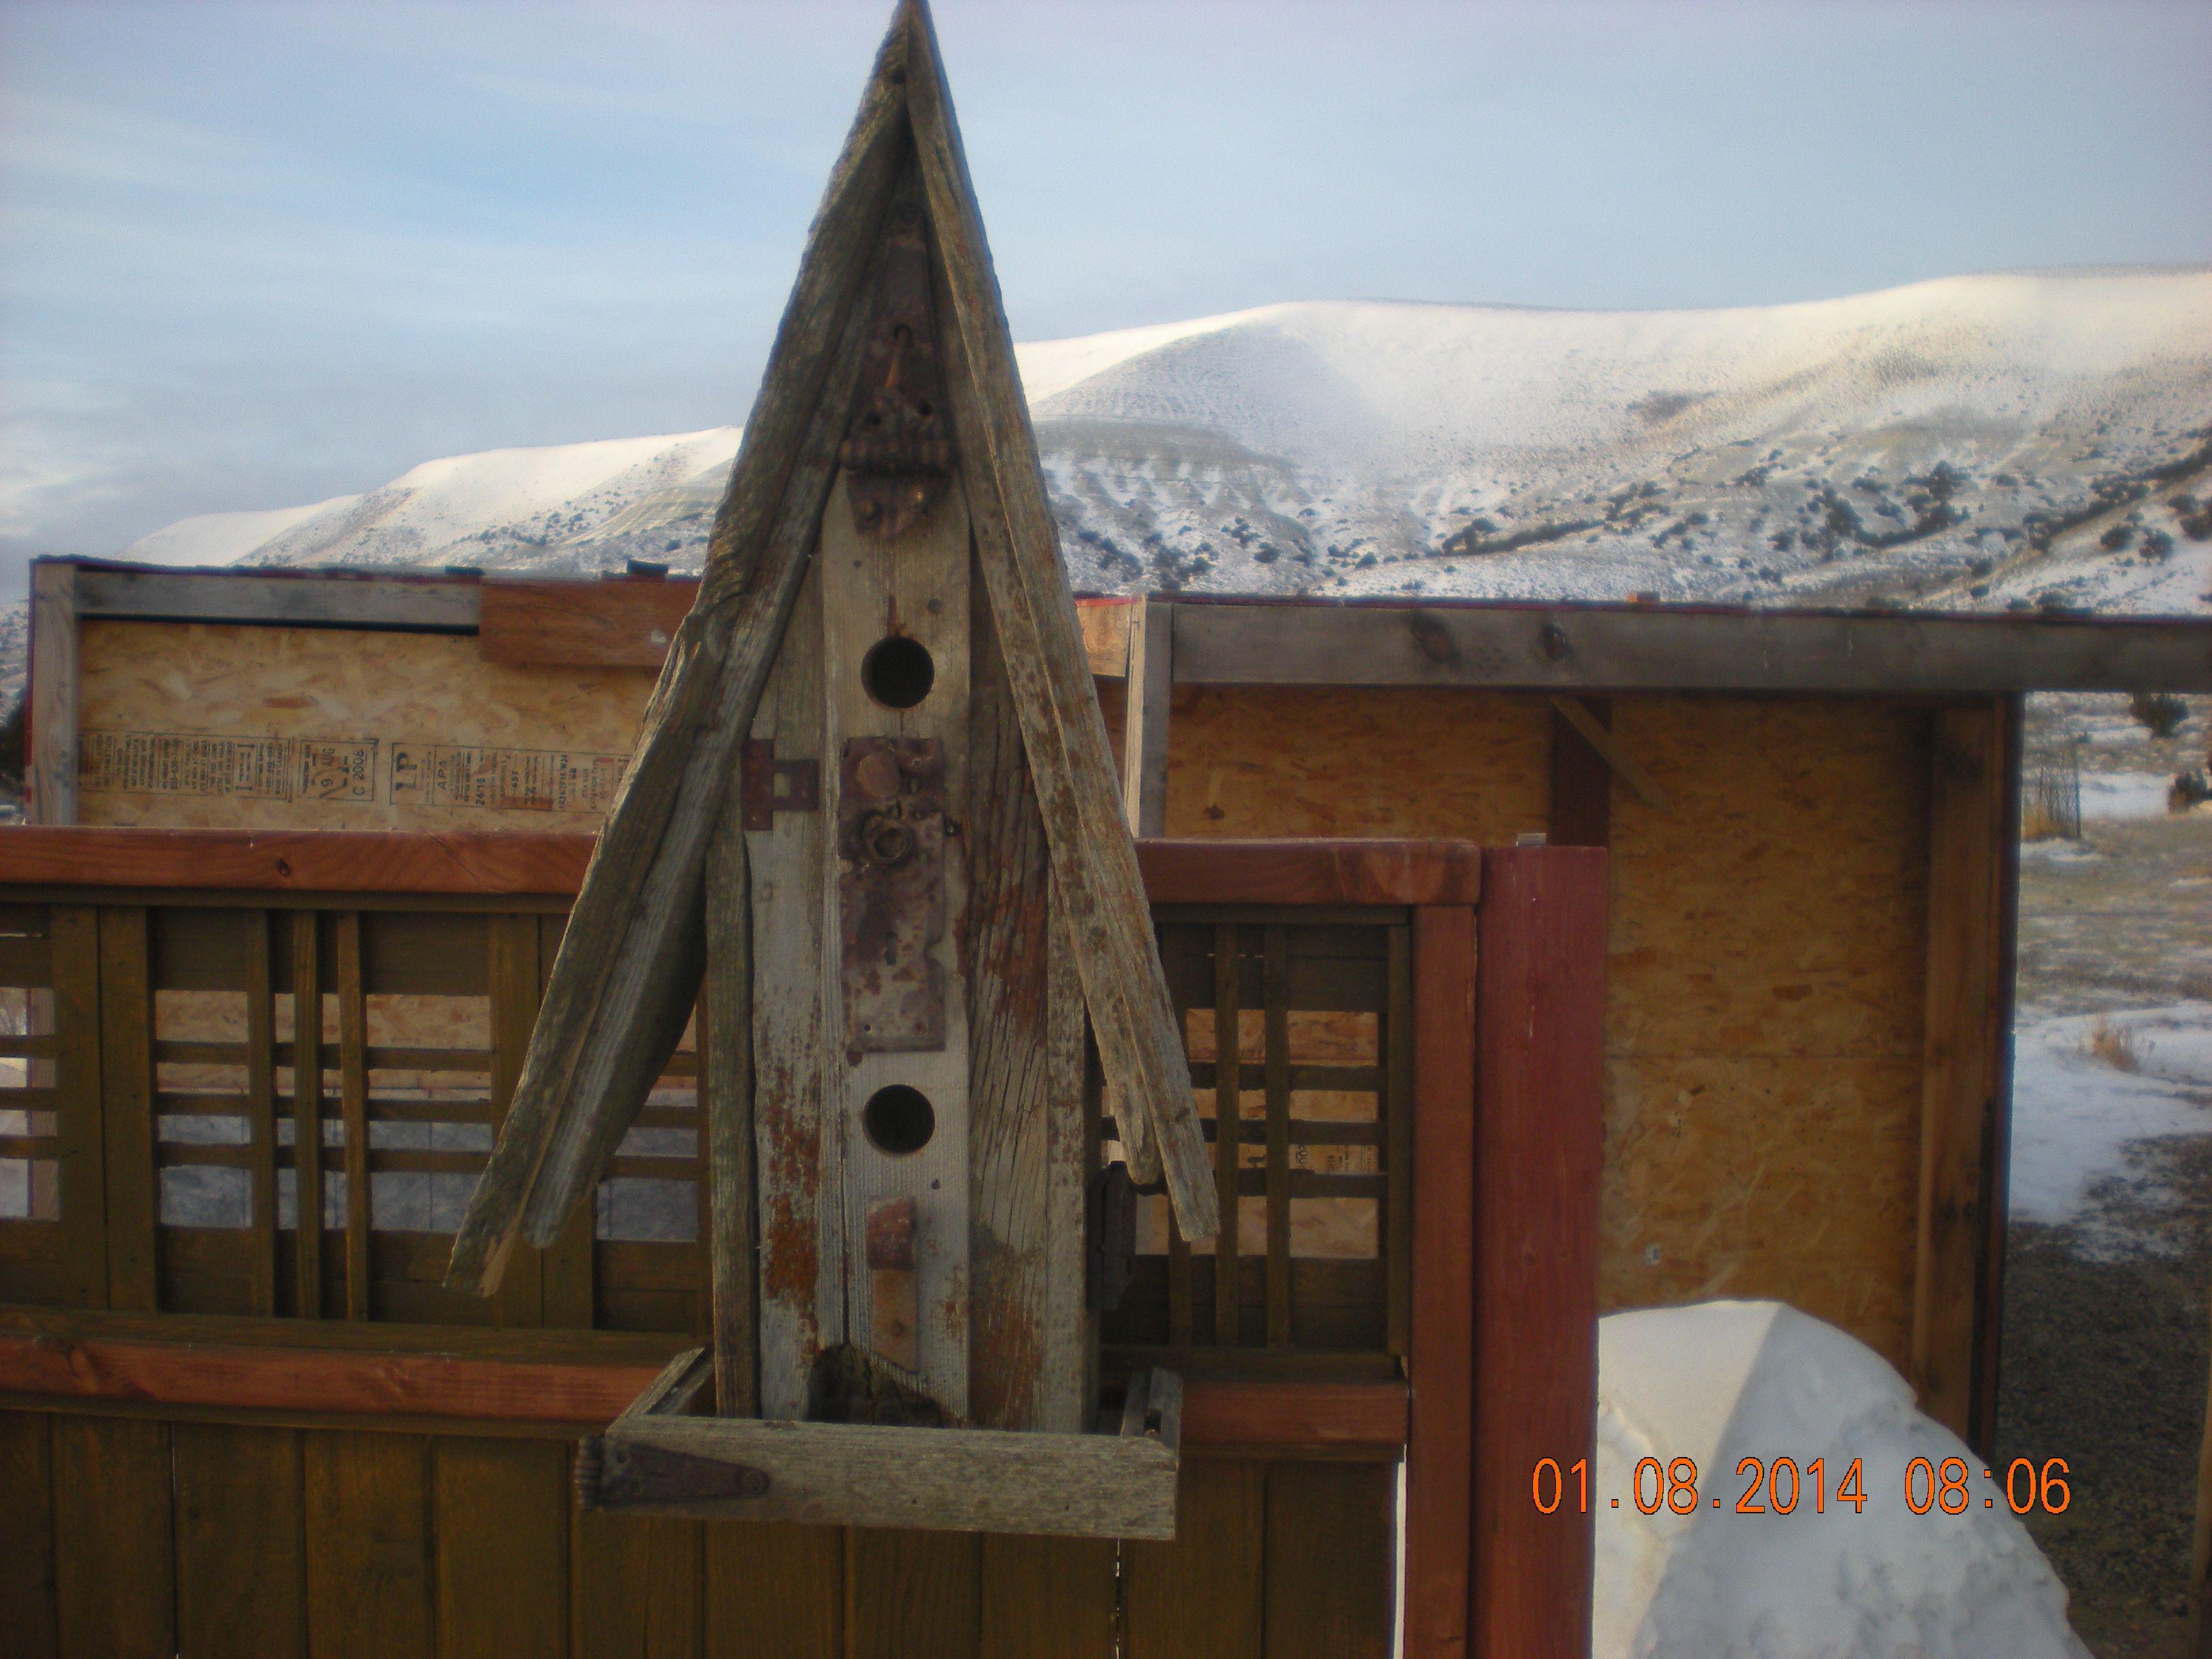 Homes for poor birds